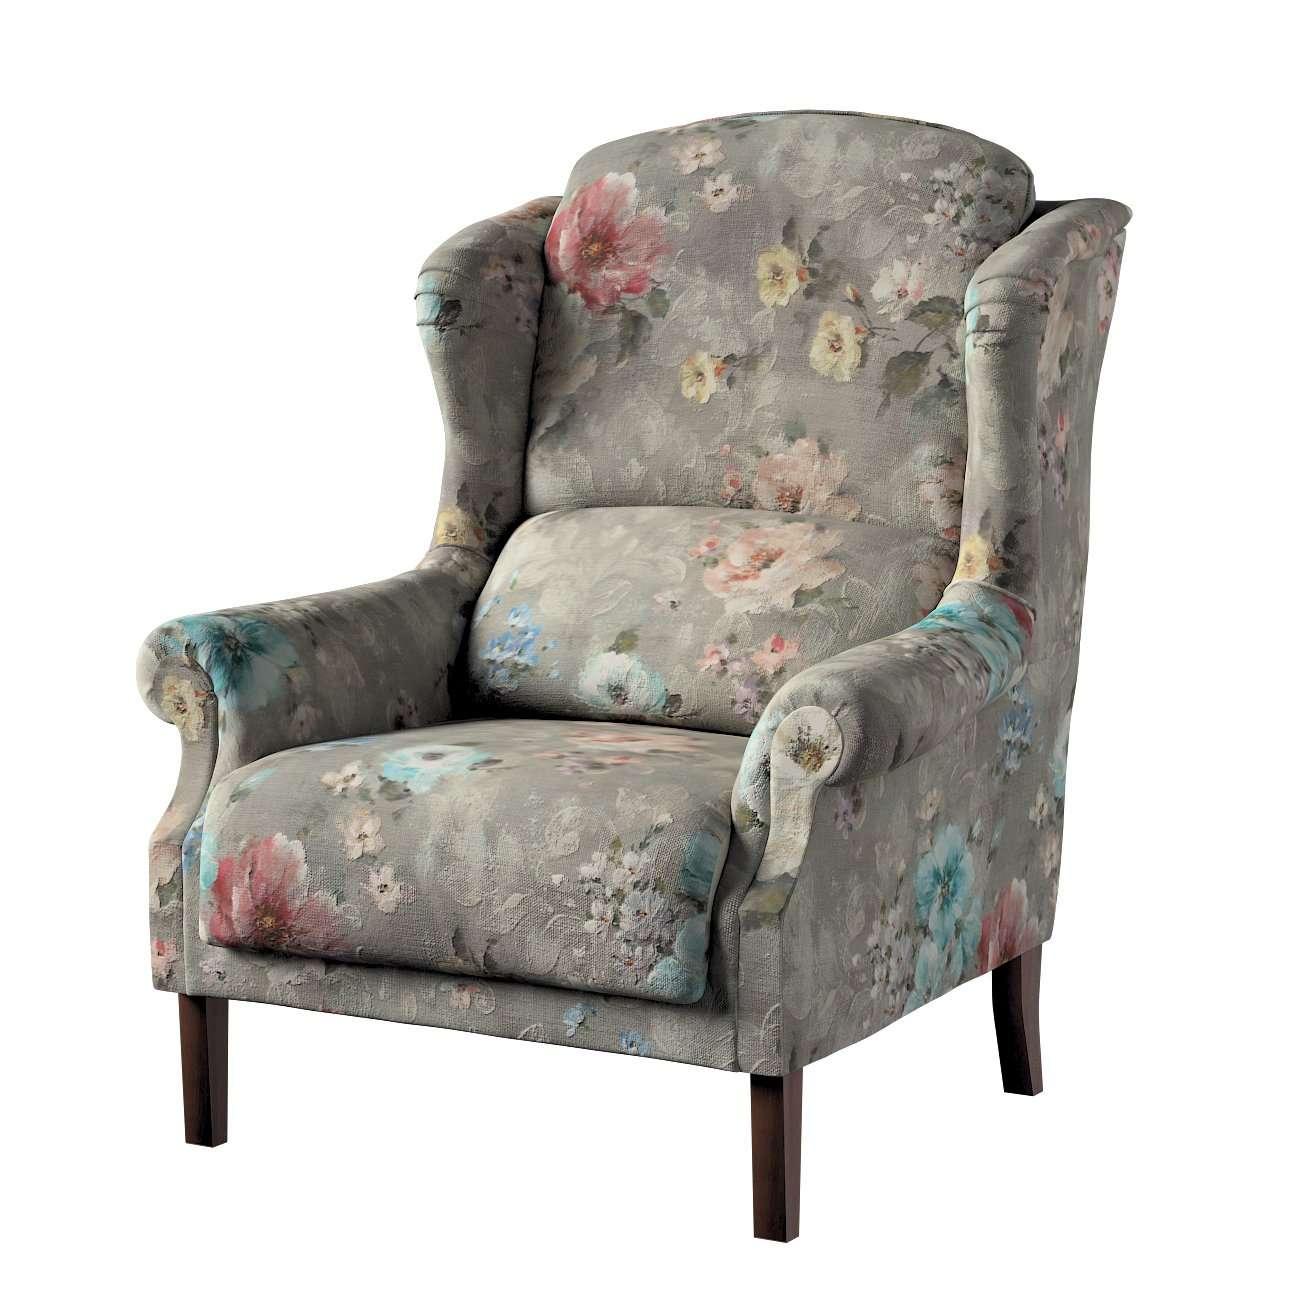 Fotel Unique w kolekcji Monet, tkanina: 137-81